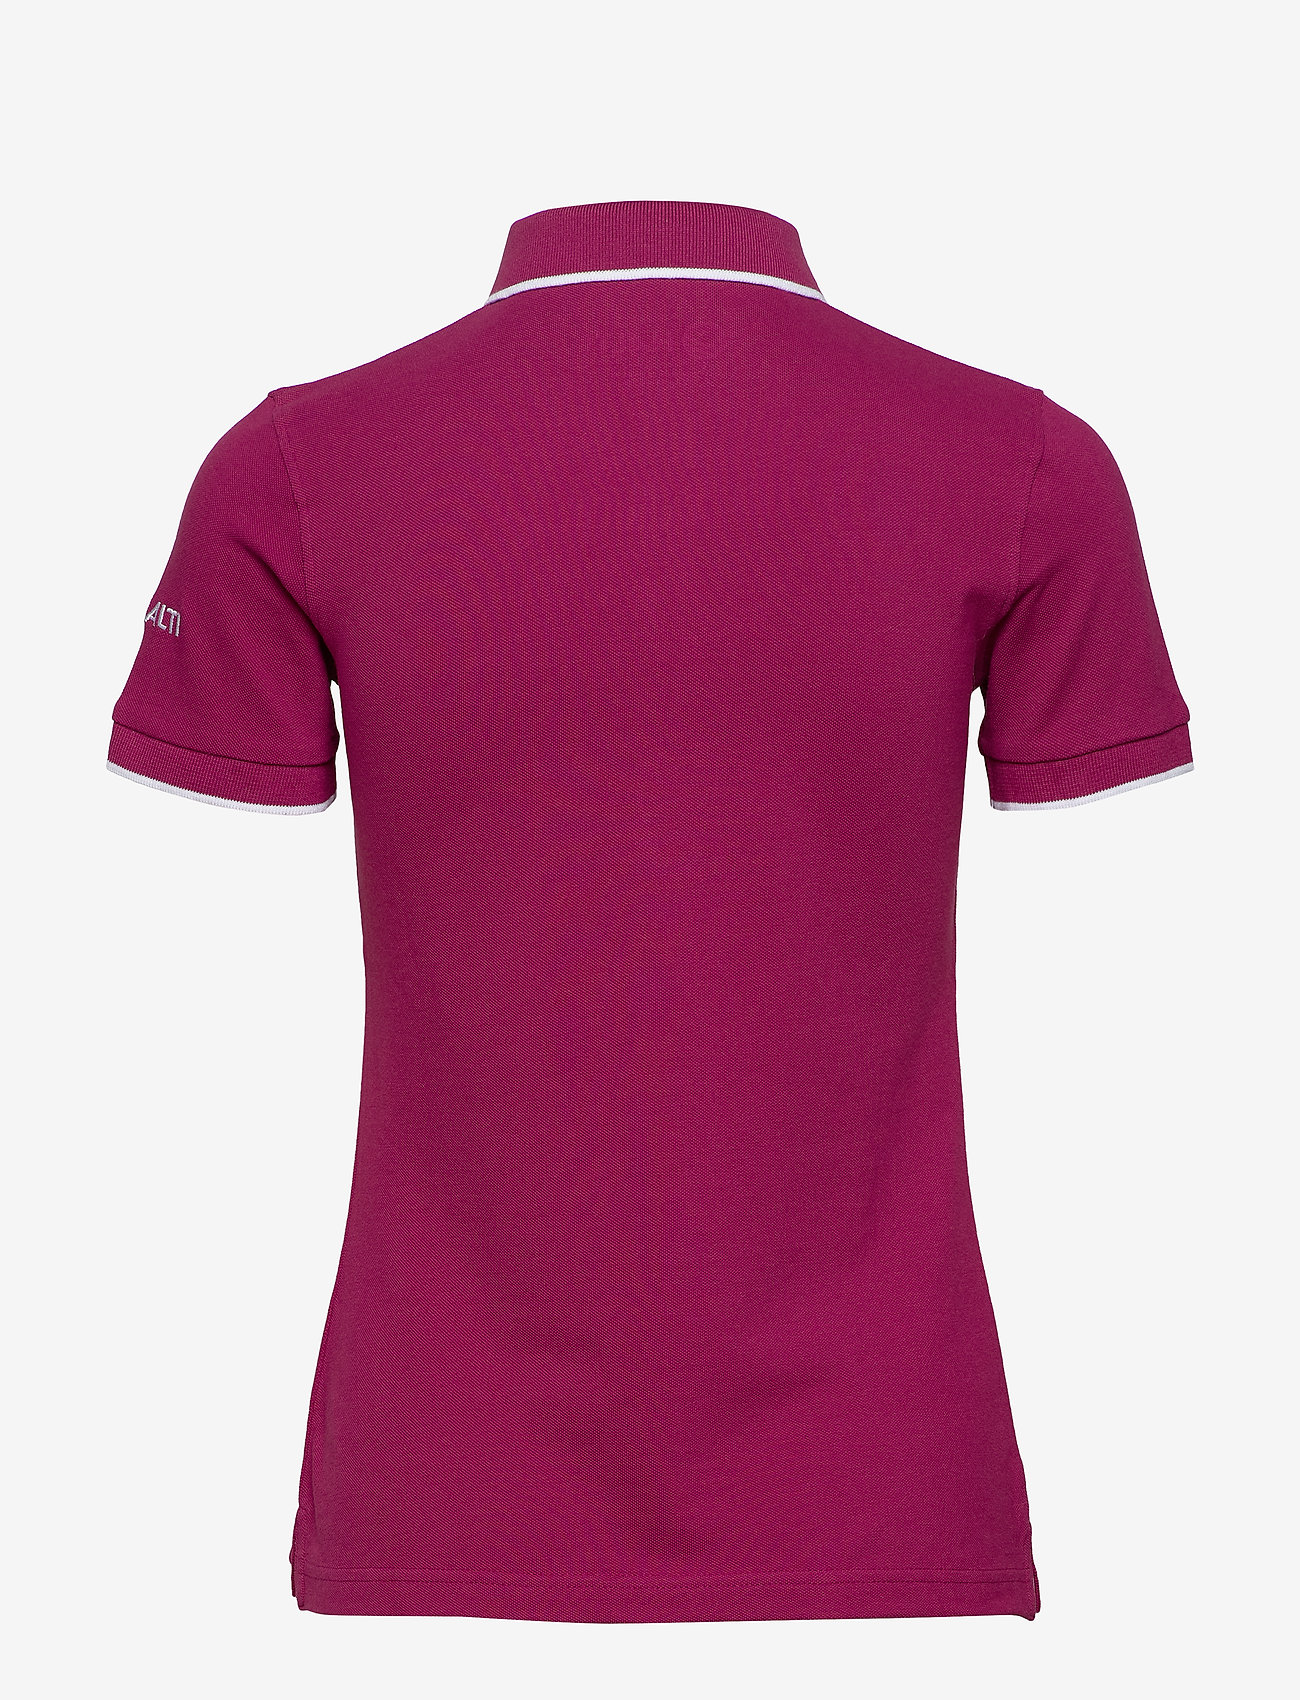 Vuokko Women's Pique Polo Shirt (Wild Aster Purple) (22.45 €) - Halti VWAFP